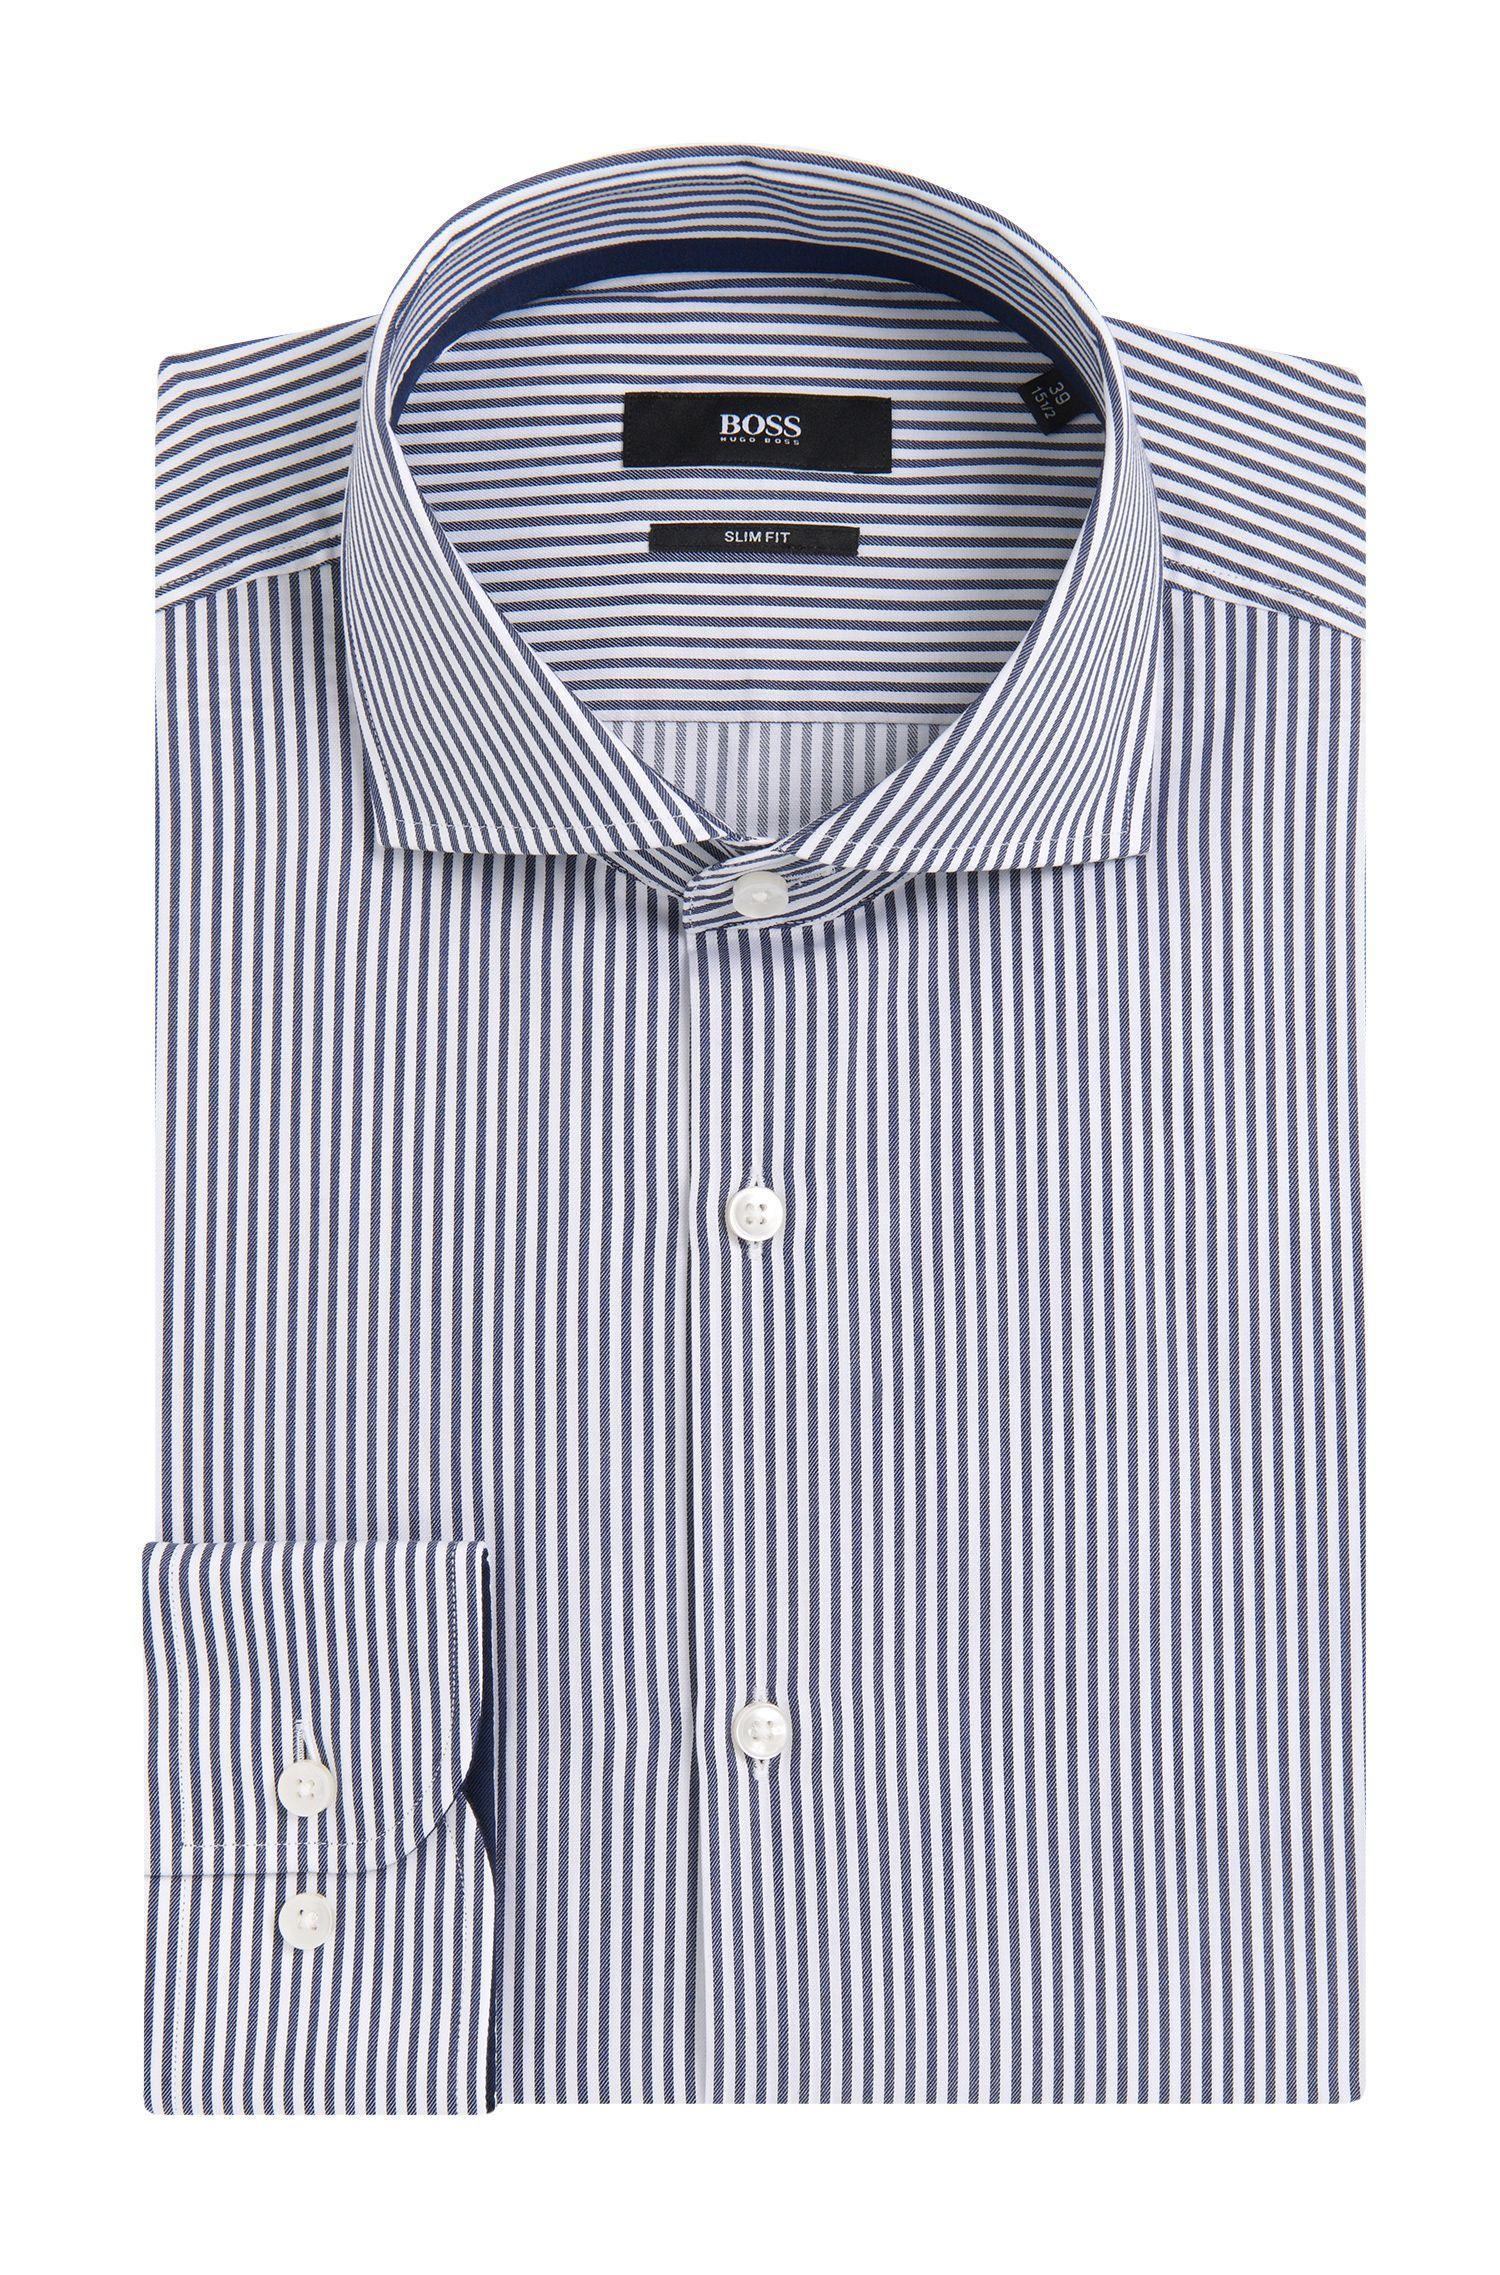 'Jery' | Slim Fit, Cotton Dress Striped Shirt